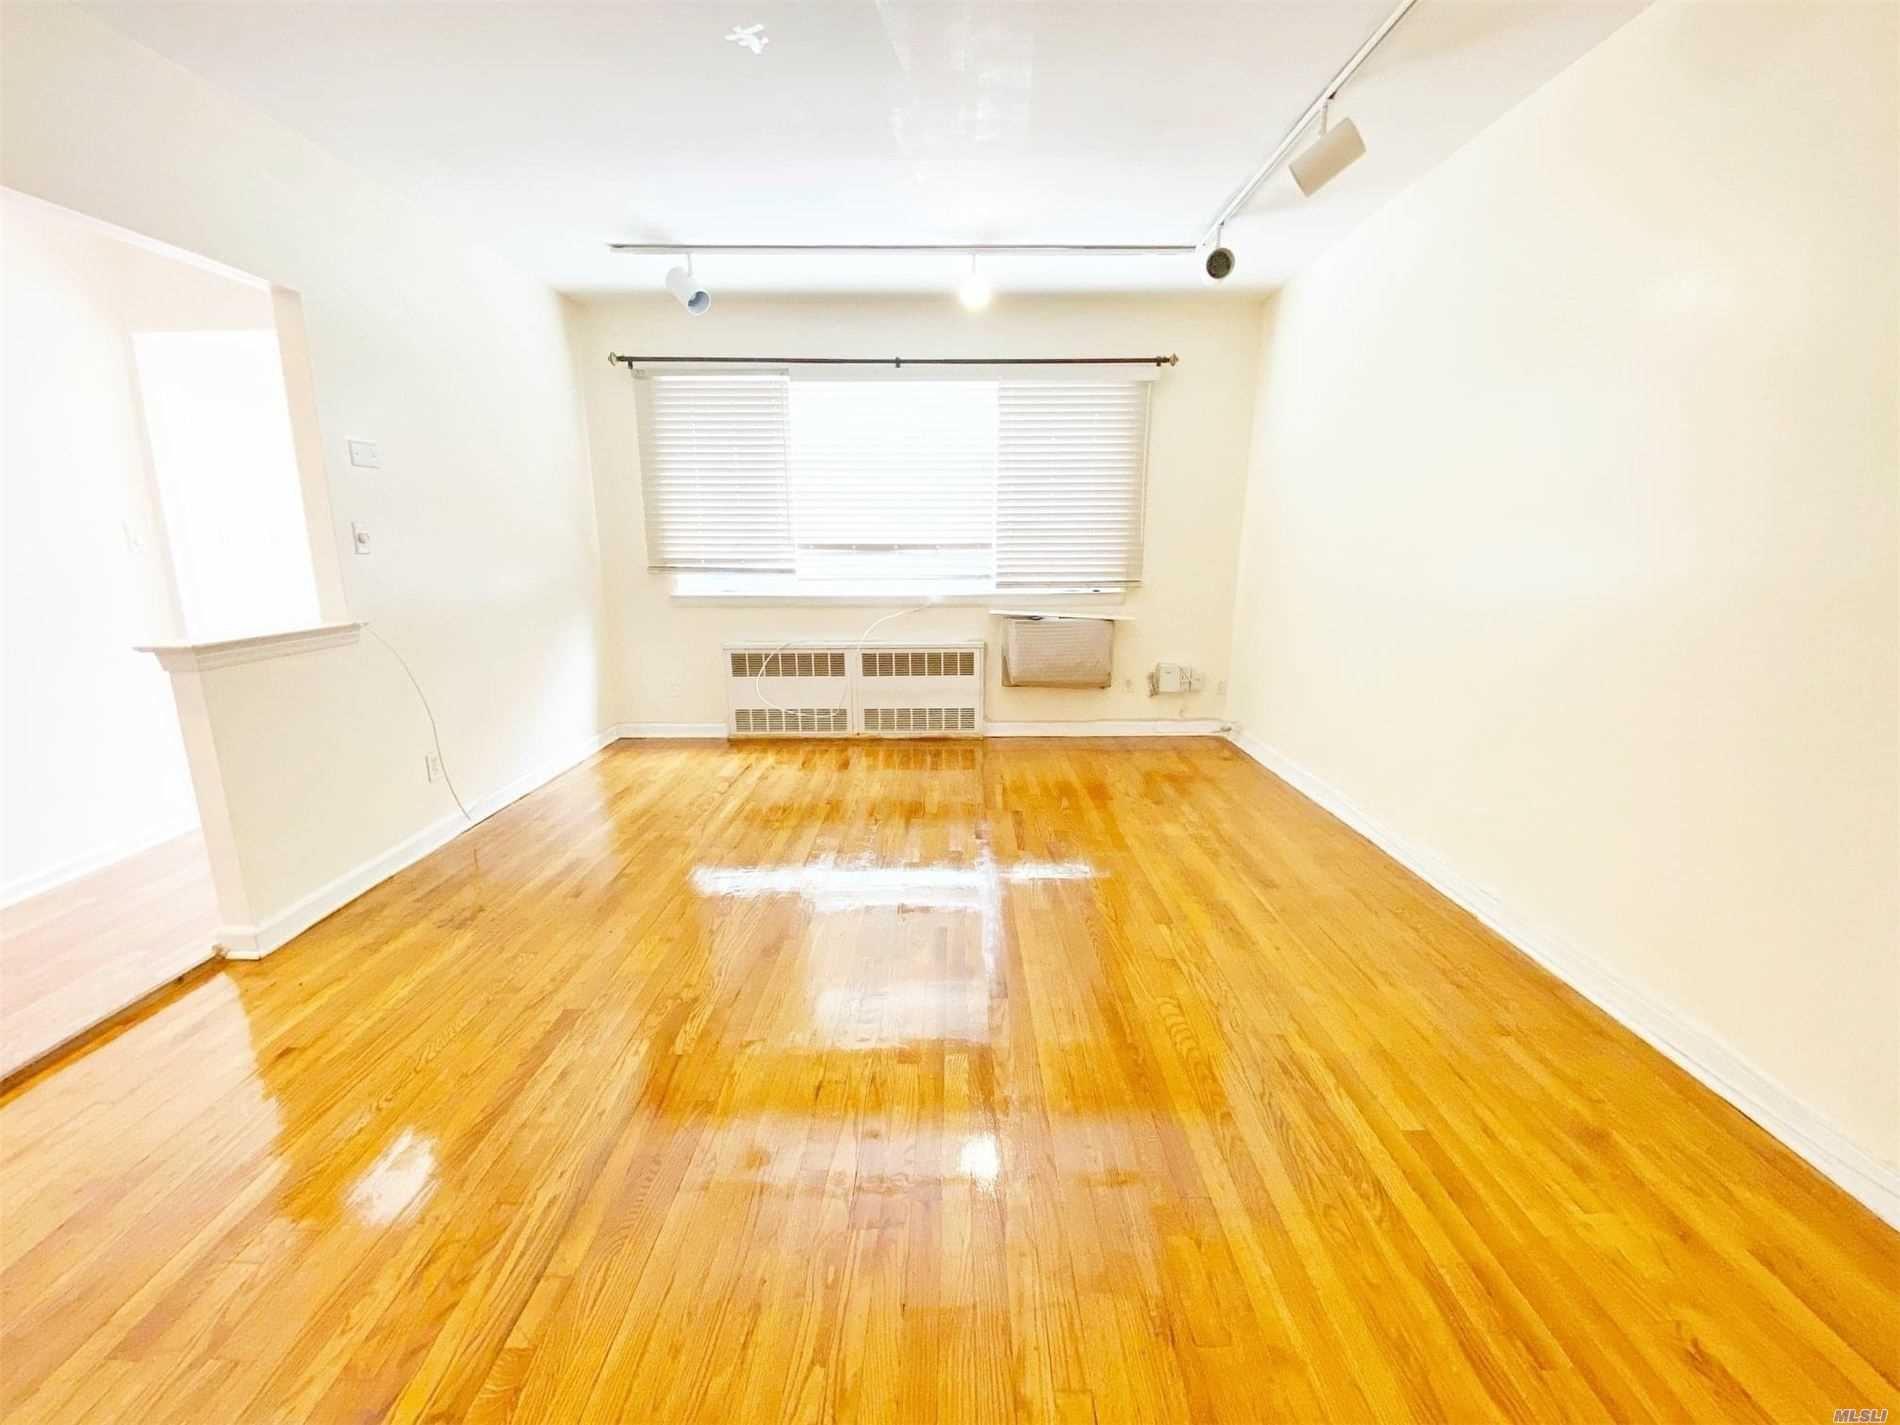 5607 Avenue J, Flatlands, NY 11234 - MLS#: 3233879